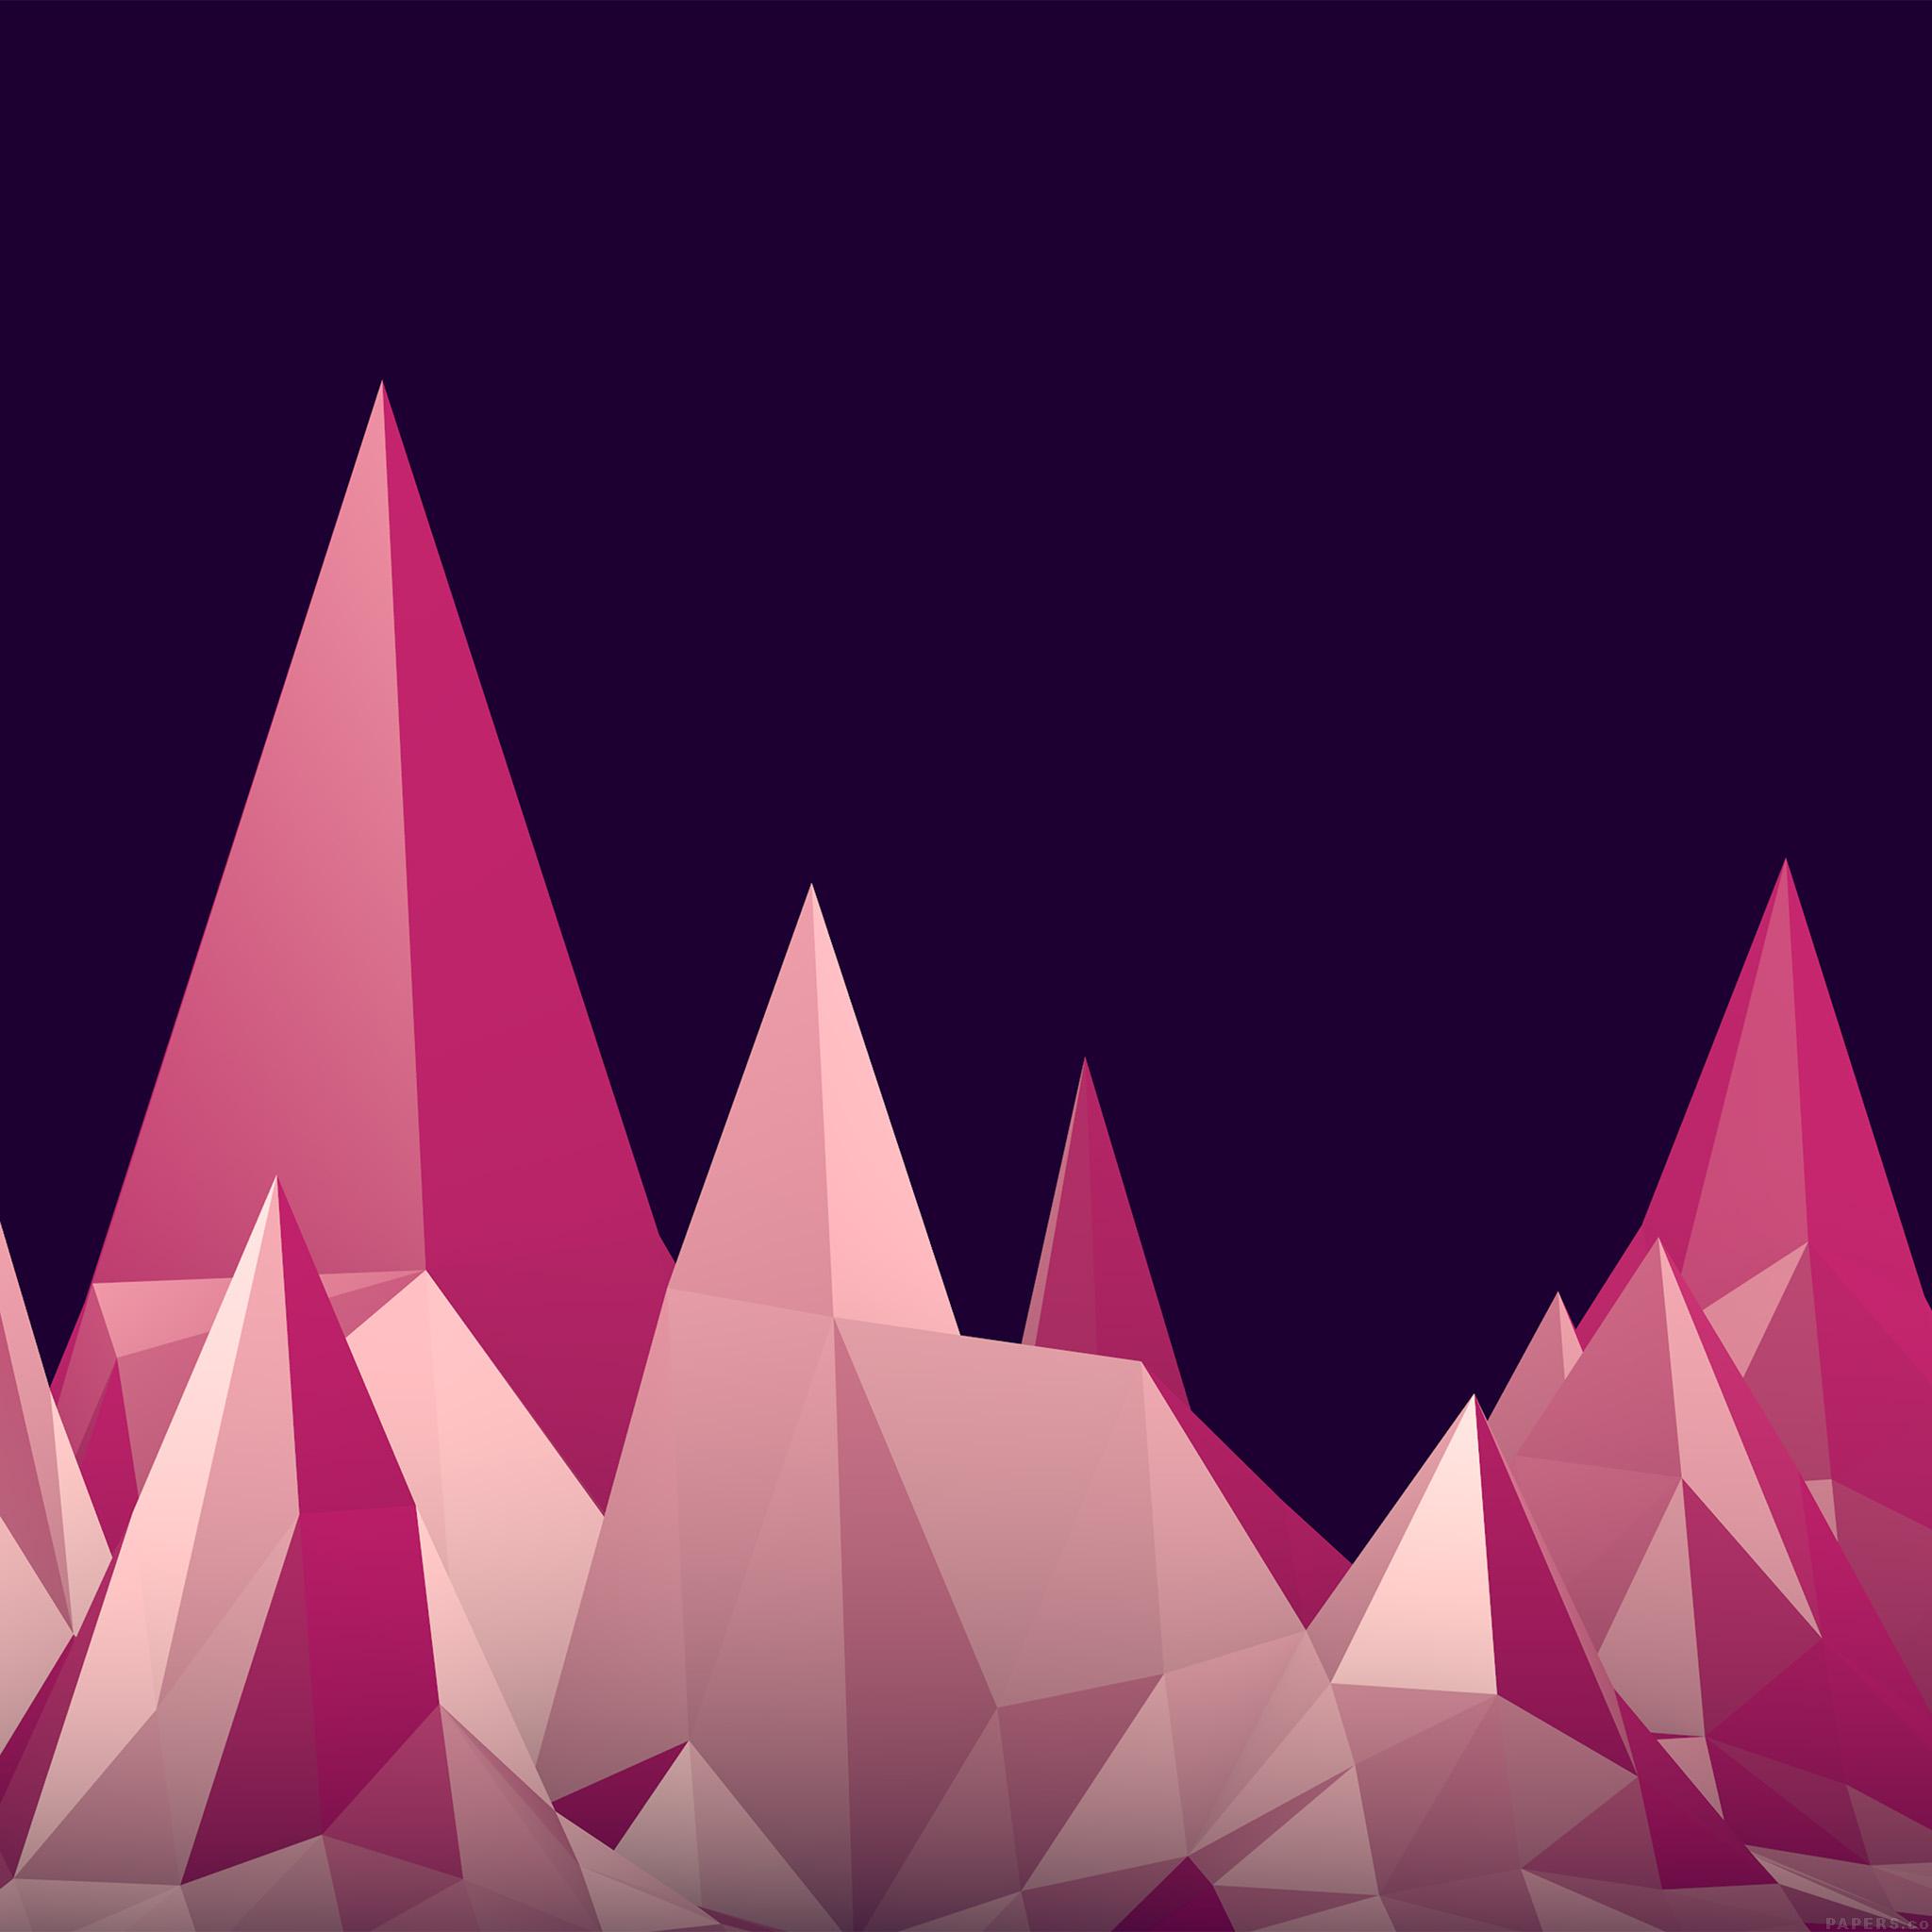 3d Parallax Wallpaper Pro Vf46 Sharp Triangle Digital Graphic Pattern